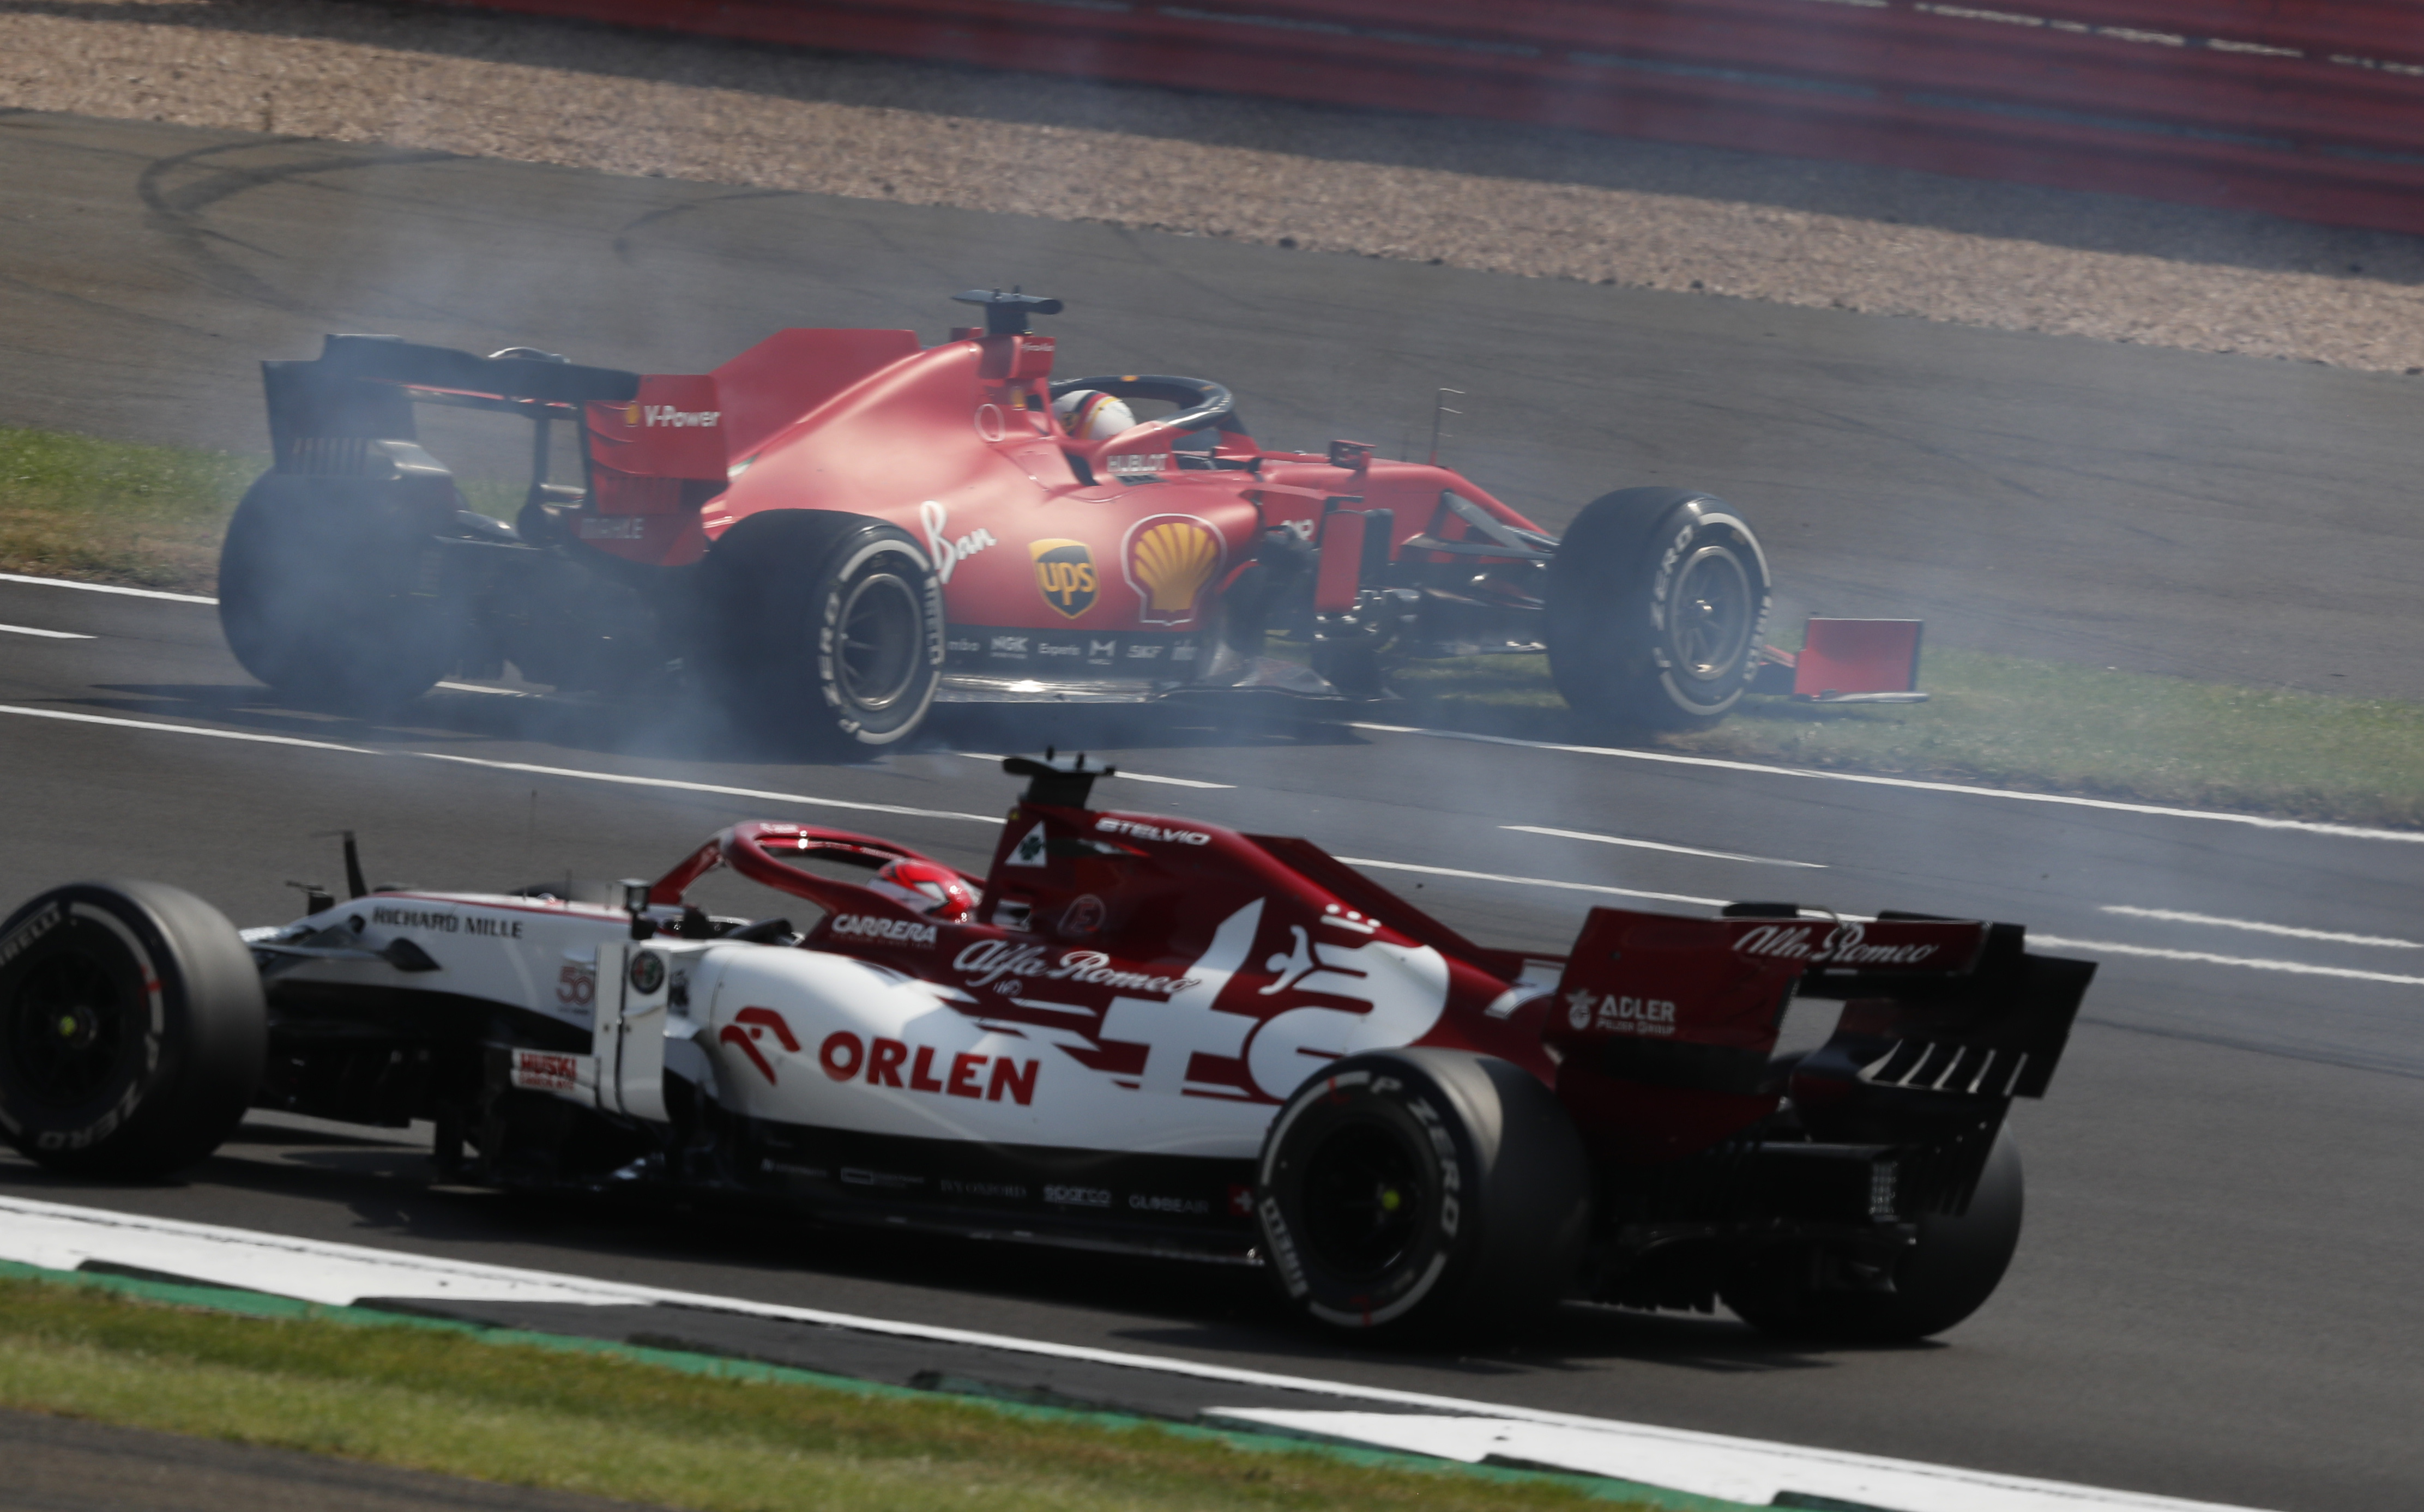 Sebastian Vettel Ferrari spin 70th Anniversary Grand Prix Silverstone 2020